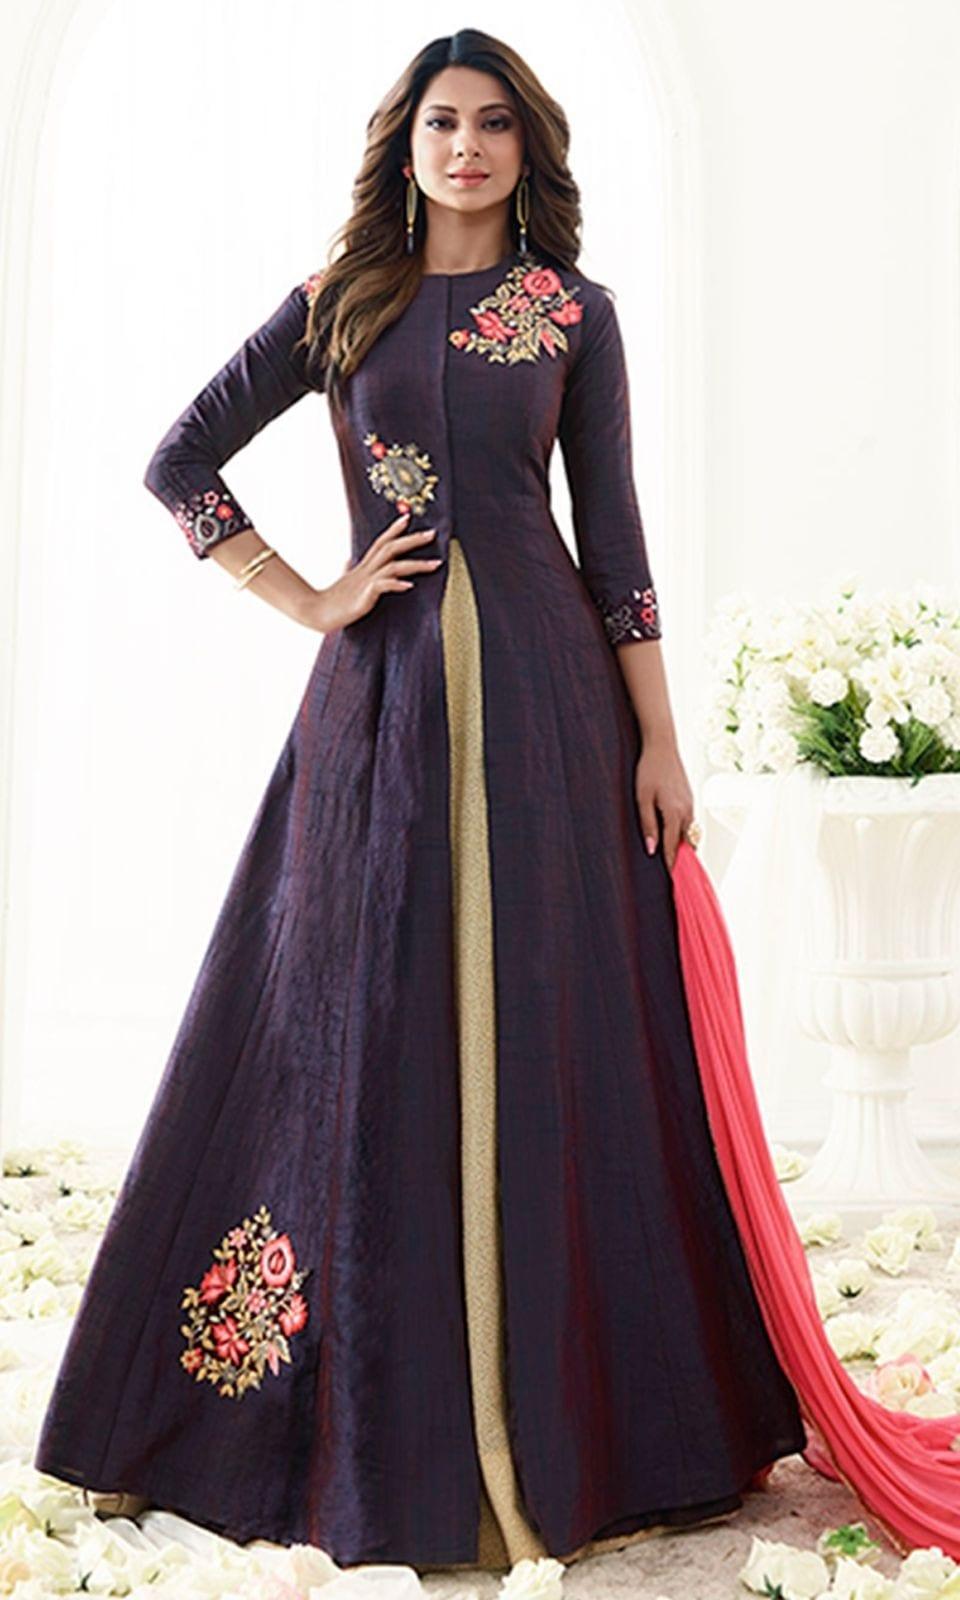 Purple Designer Floor Length Anarkali Suit  • Designer Floor Length Anarkali Suit • Fabric : Georgette • Salwar Fabric : Shantoon • Dupatta Fabric : Chiffon • Size : Semi-Stitched (customizable Upto size-44)  SKU: SUEMUG1113 Rs. 3,599  #styles #beauty #love #followme #roposo #fashion #model #indian